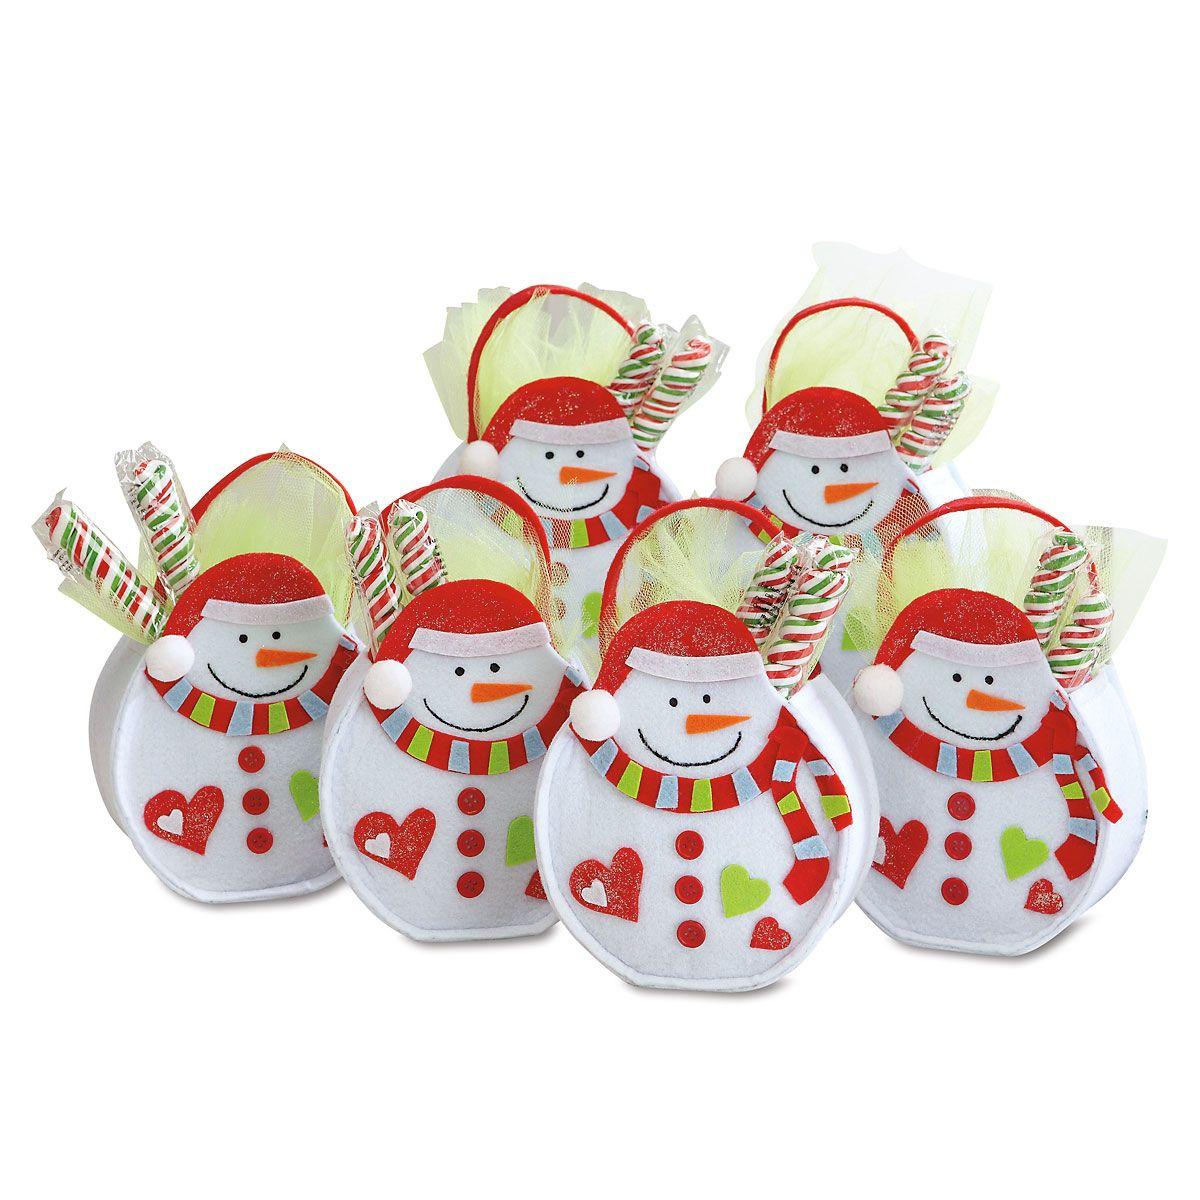 Christmas Snowman Felt Party Treat Bags